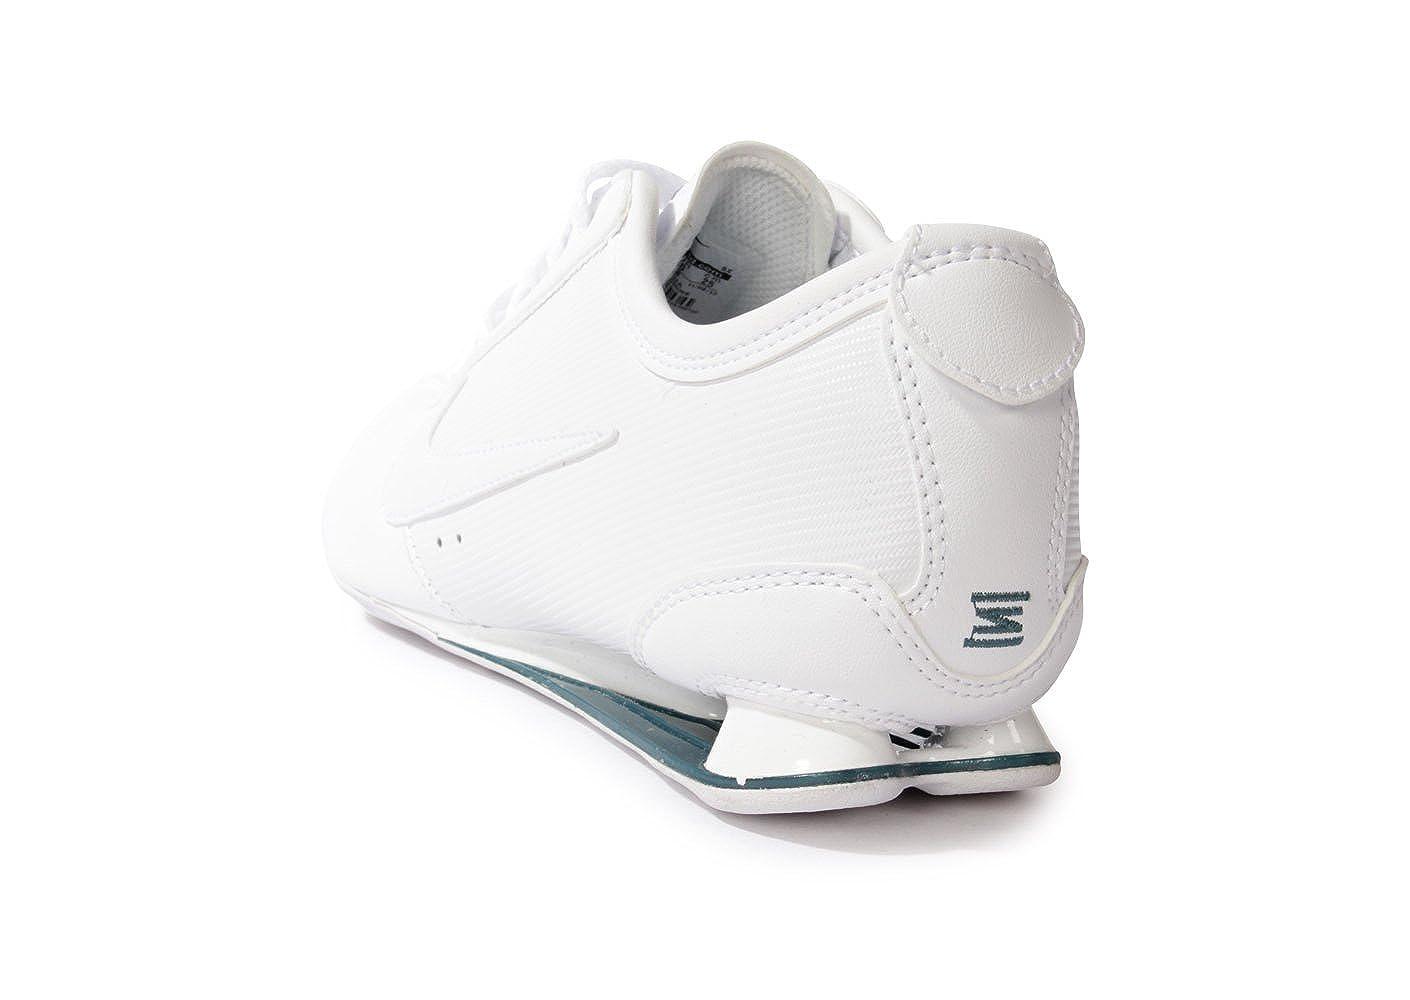 online retailer e033e daded Nike Rivalry Blanche 44 Amazon.fr Chaussures et Sacs